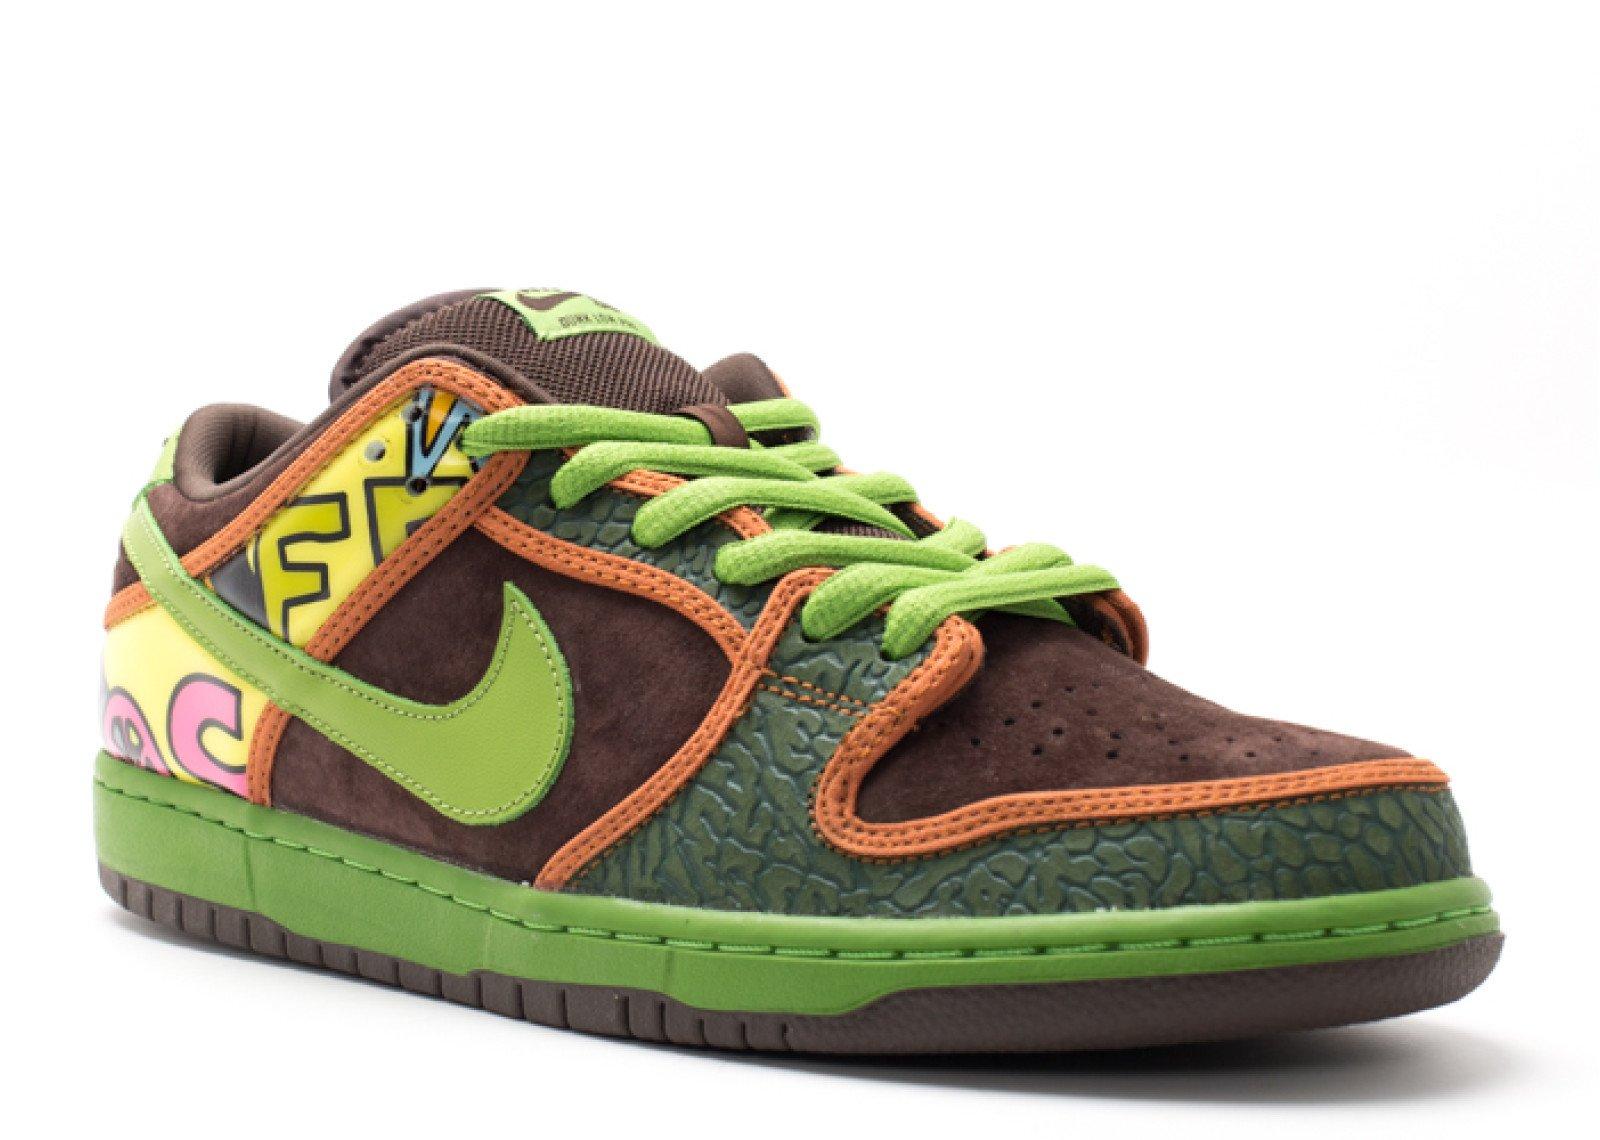 sale retailer 6bdb5 7abdf Galleon - Nike Dunk Low PRM DLS SB QS